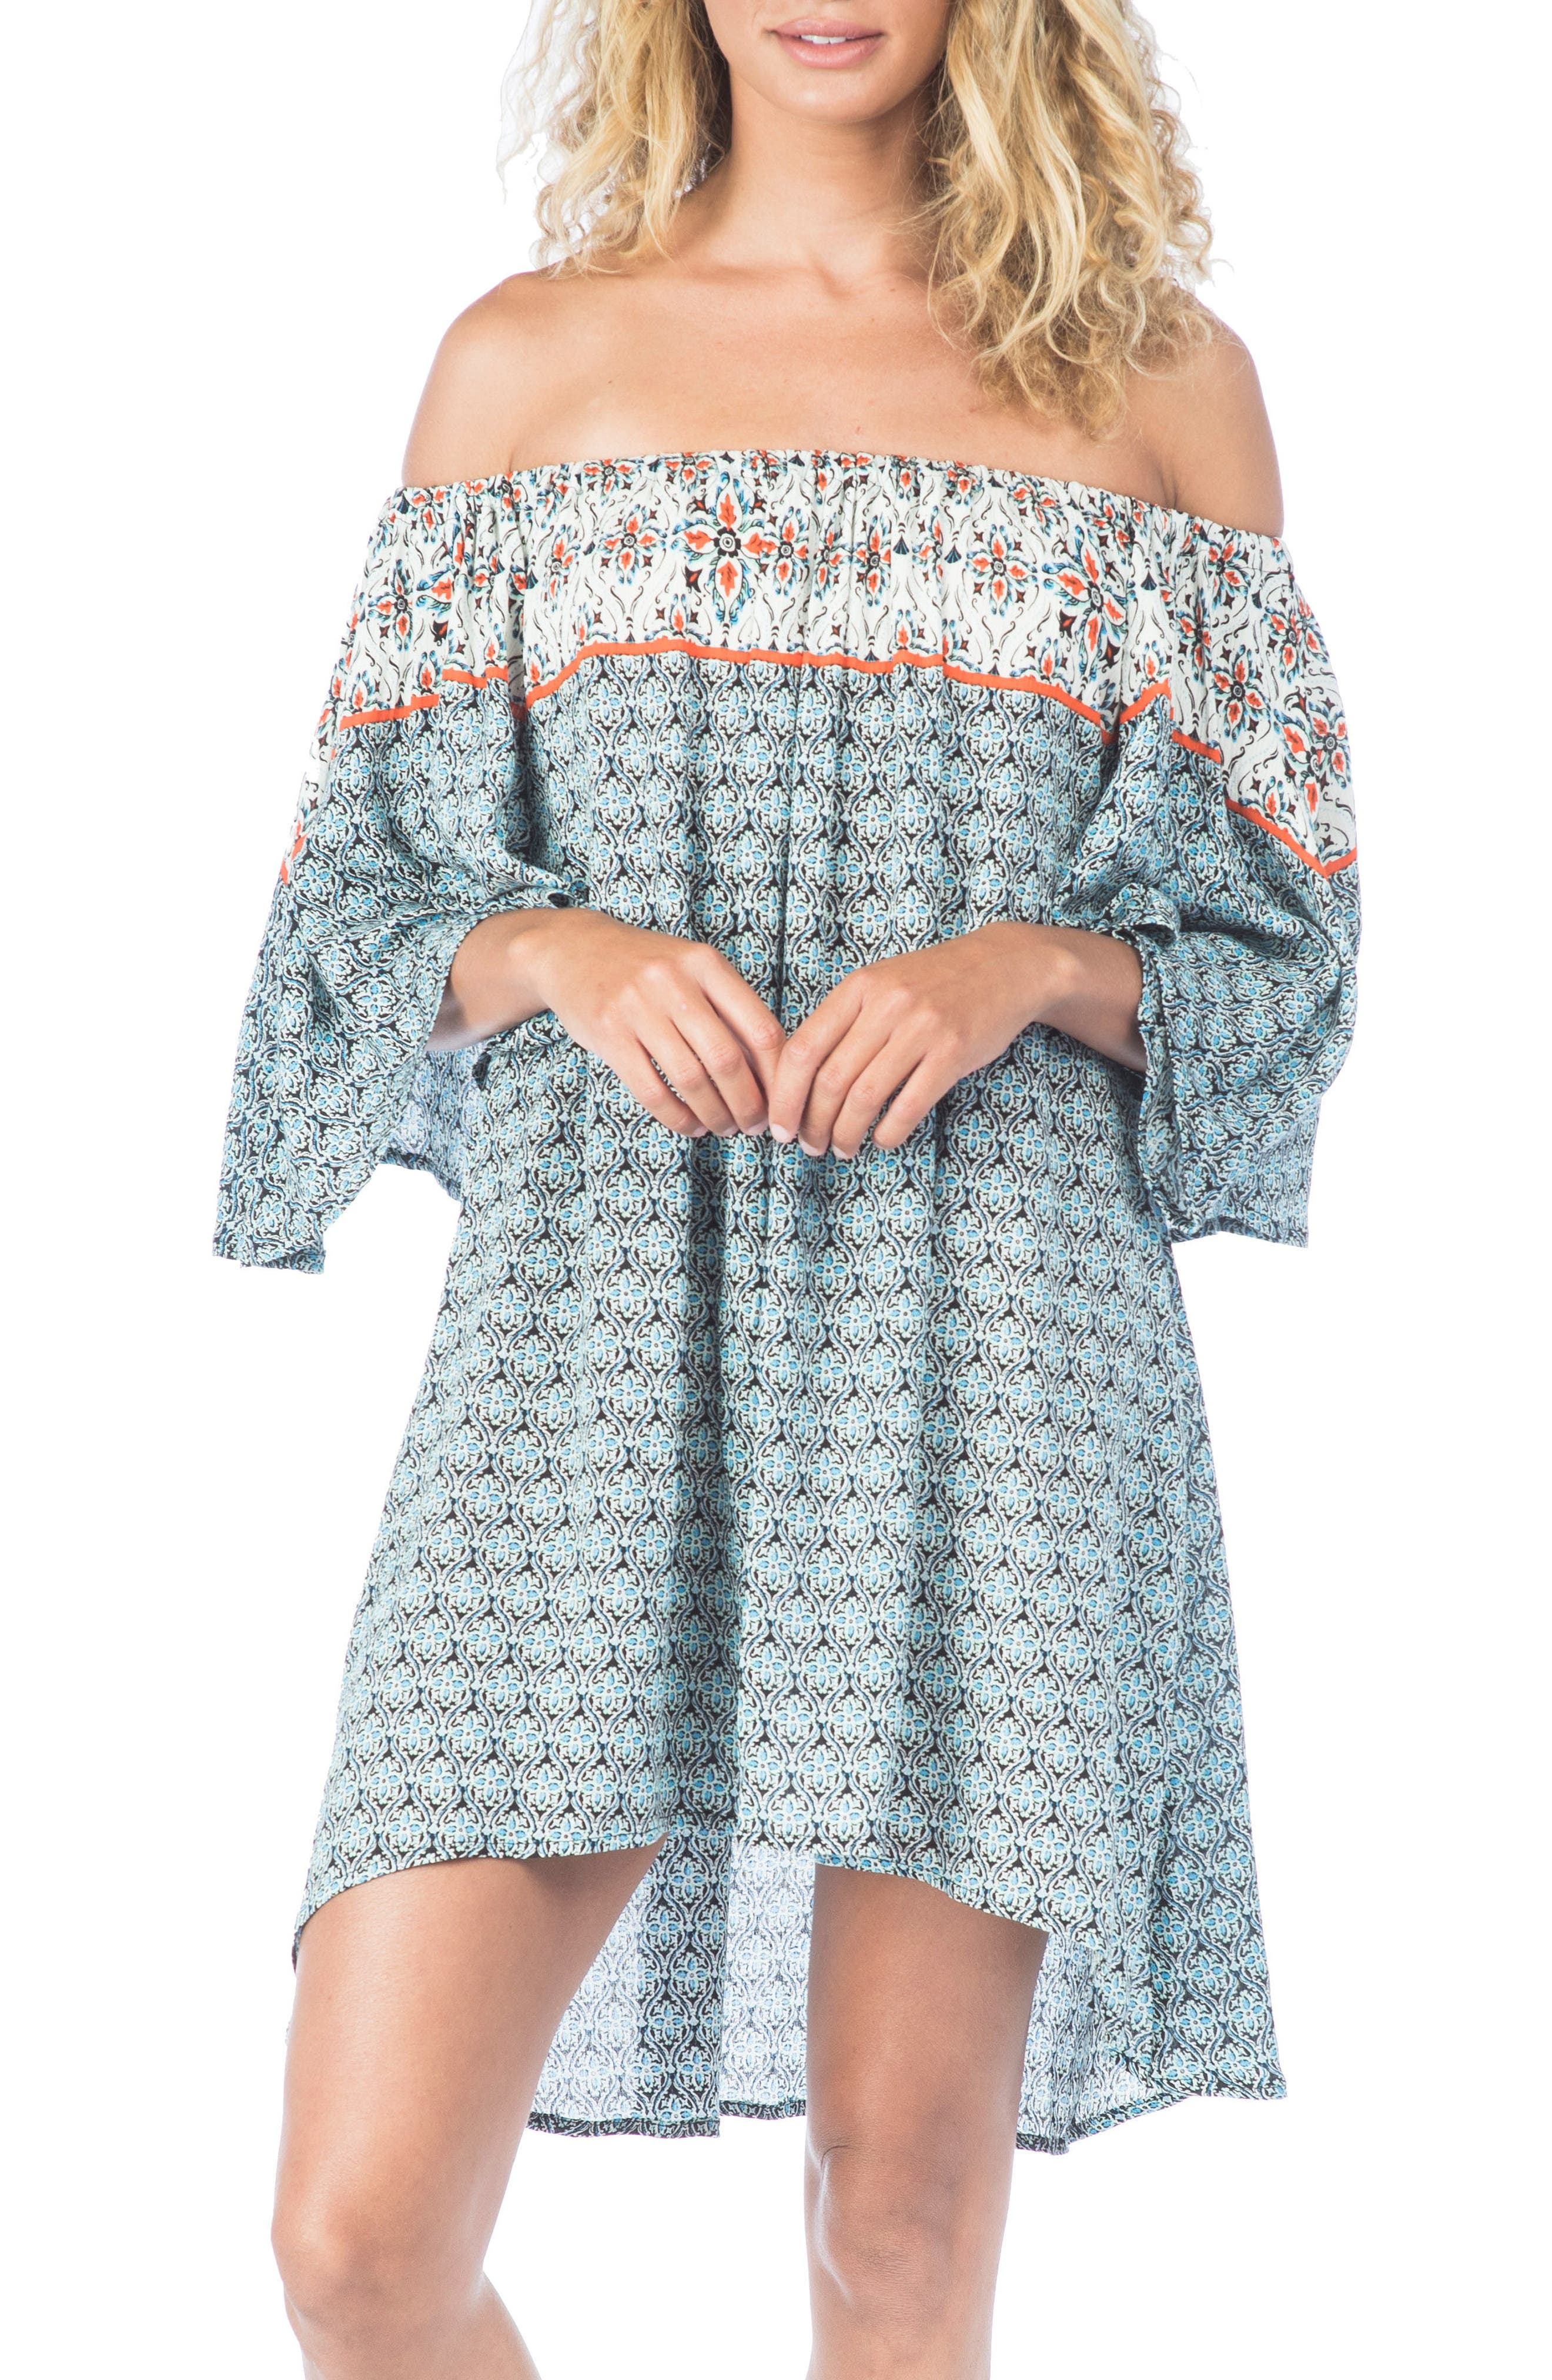 Monaco Tile Cover-Up Dress,                             Main thumbnail 1, color,                             002